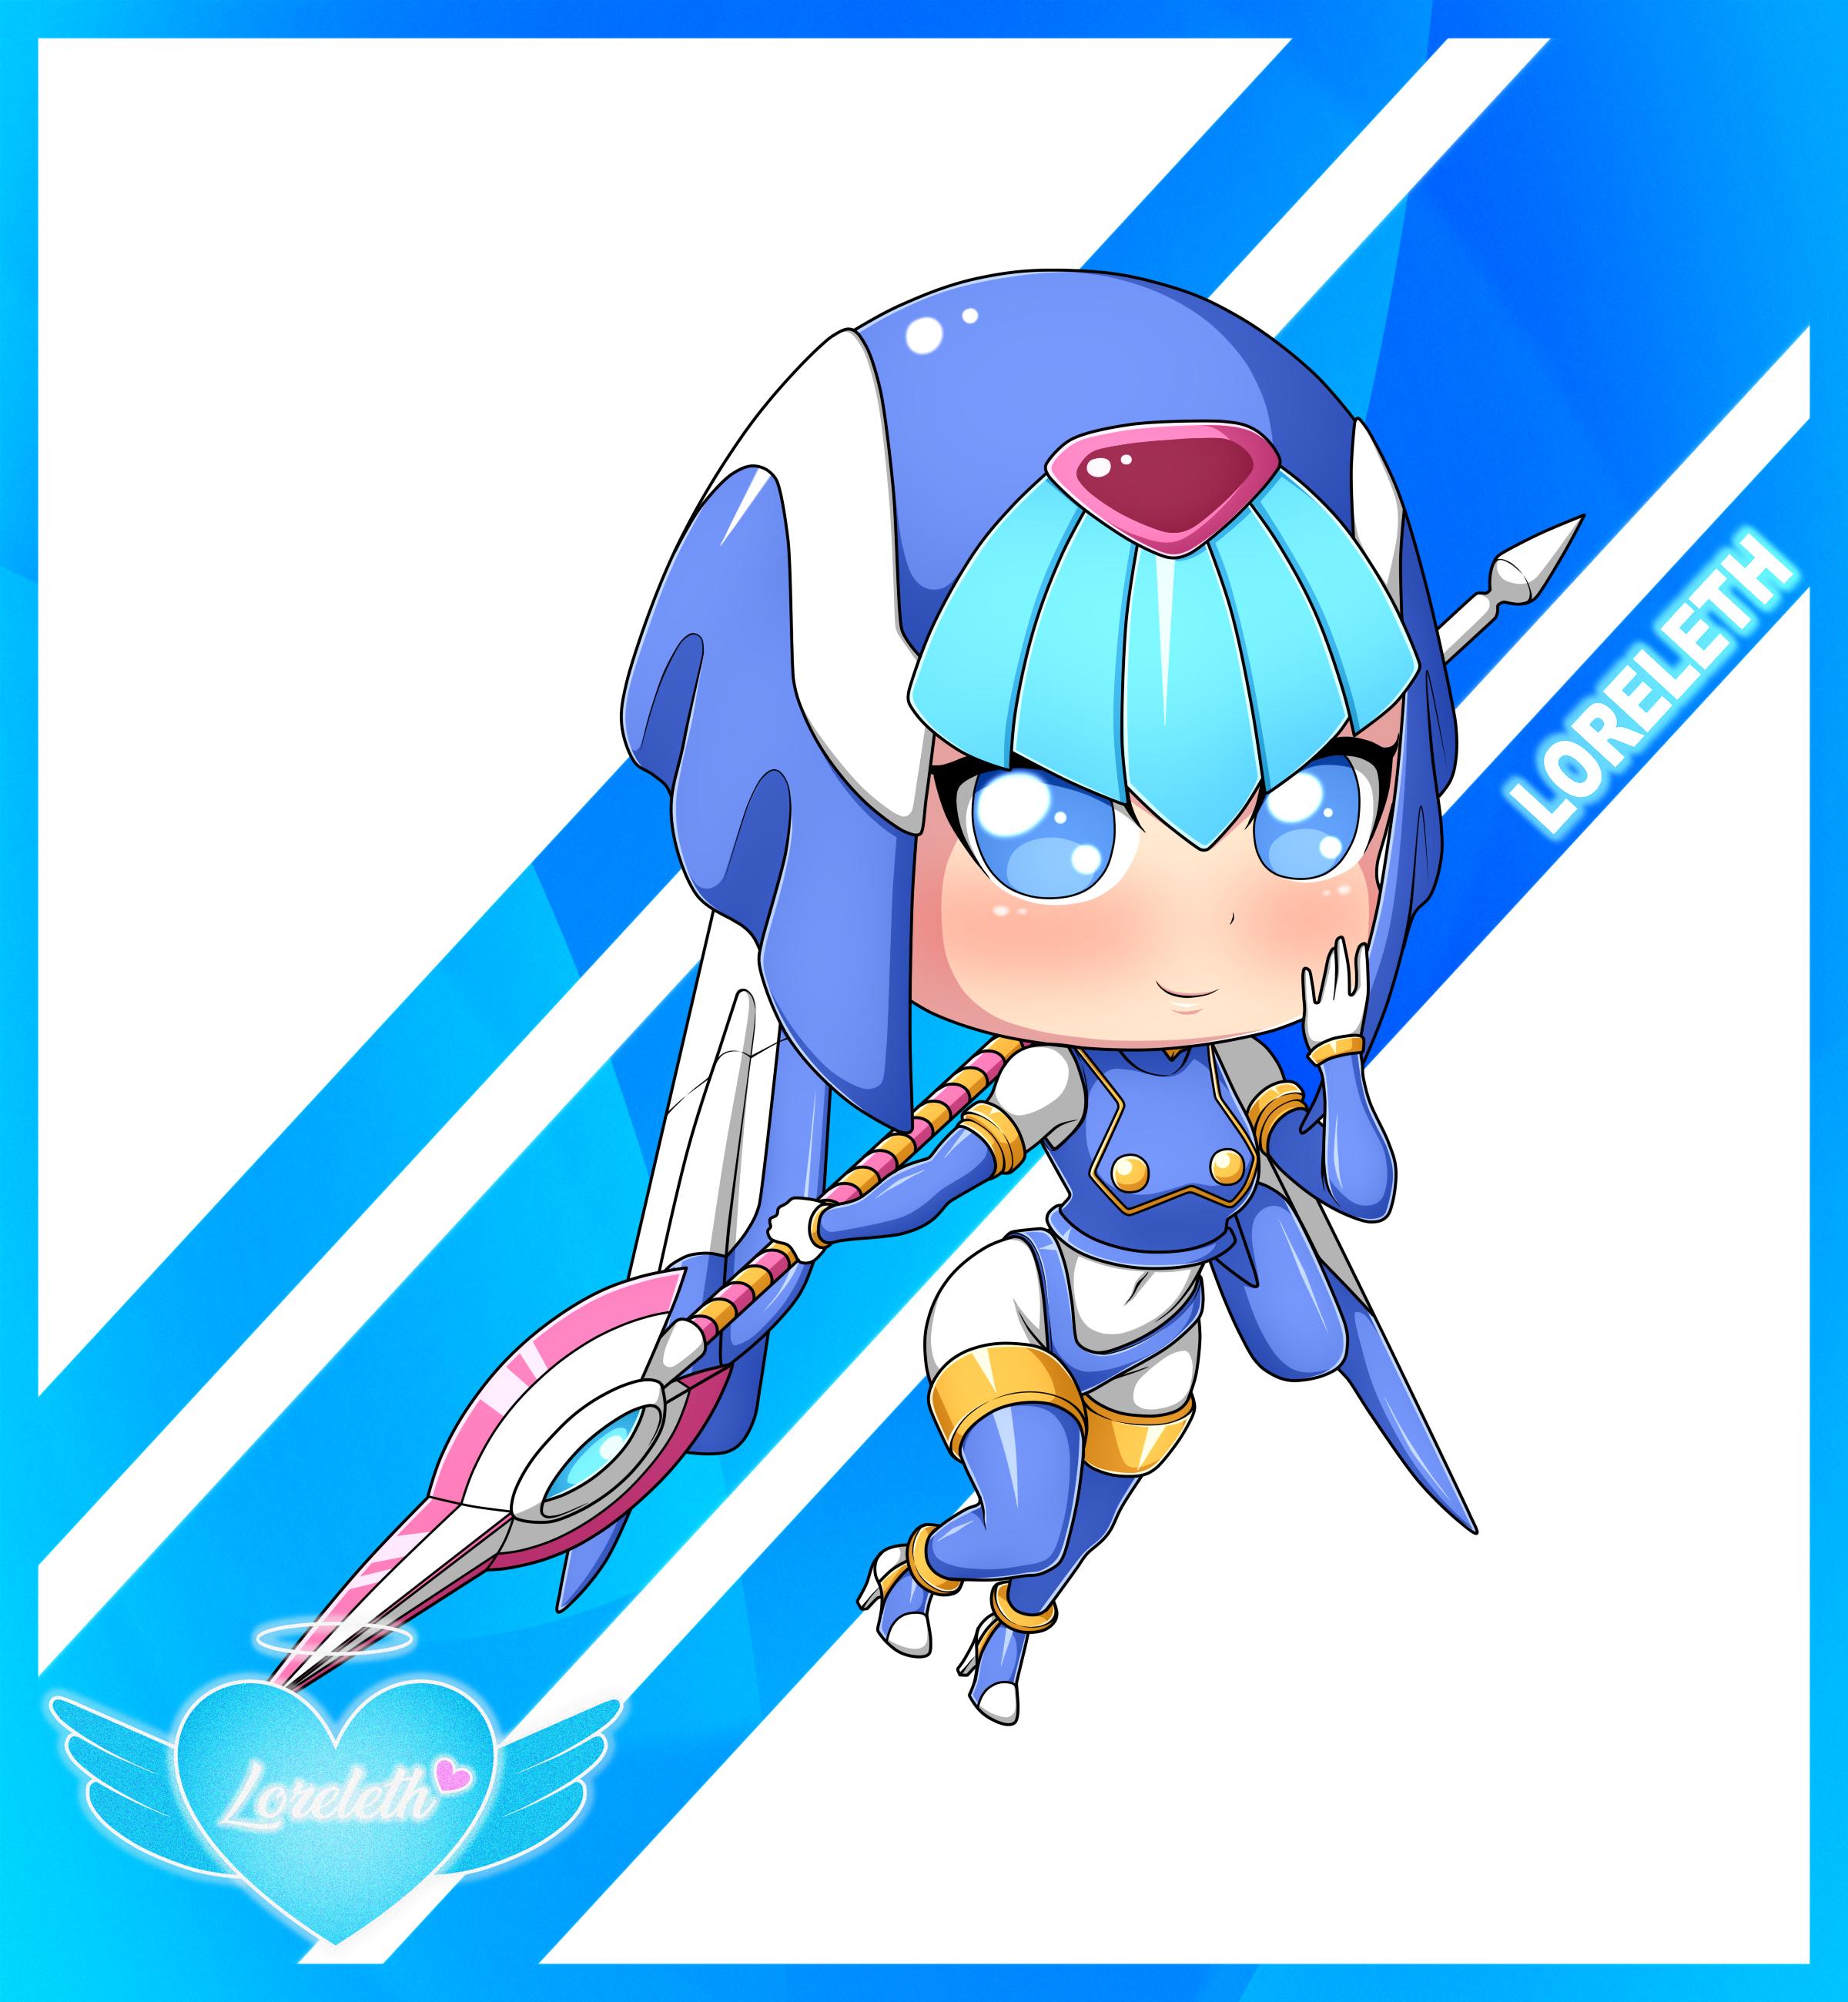 Cute Chibi Girl 39 (Commission)